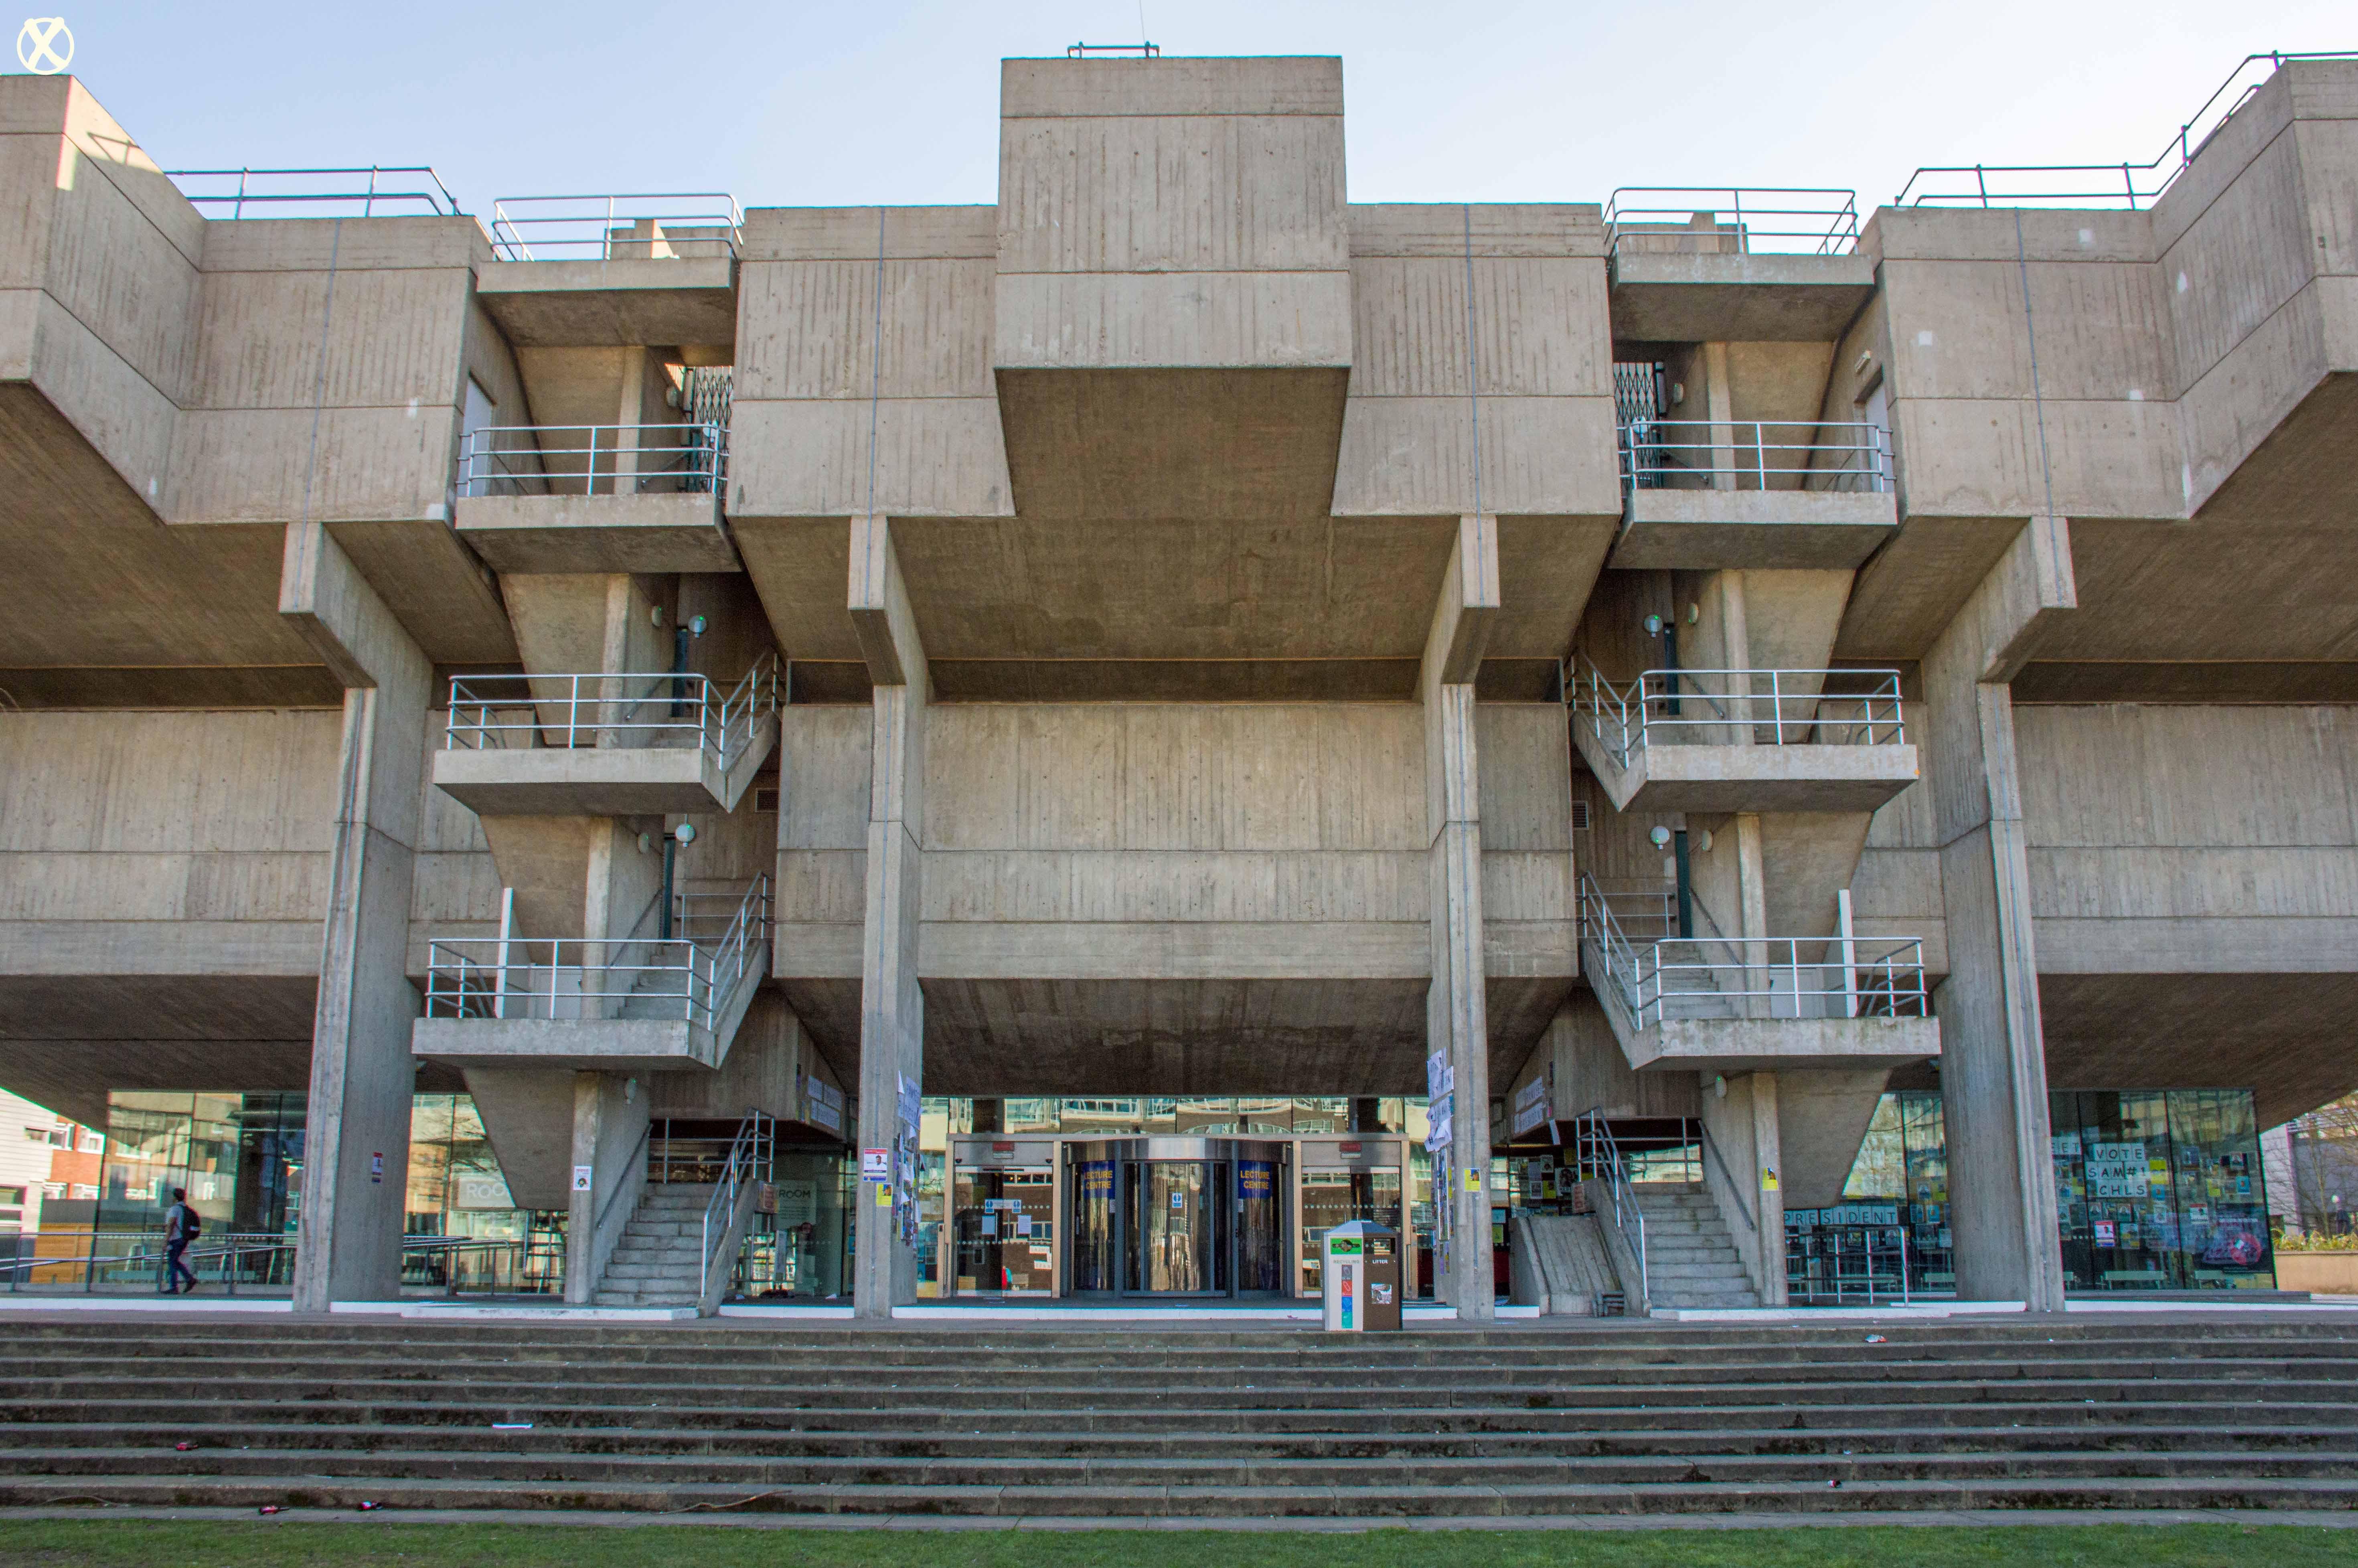 Lecture Theatre Block, Brunel University